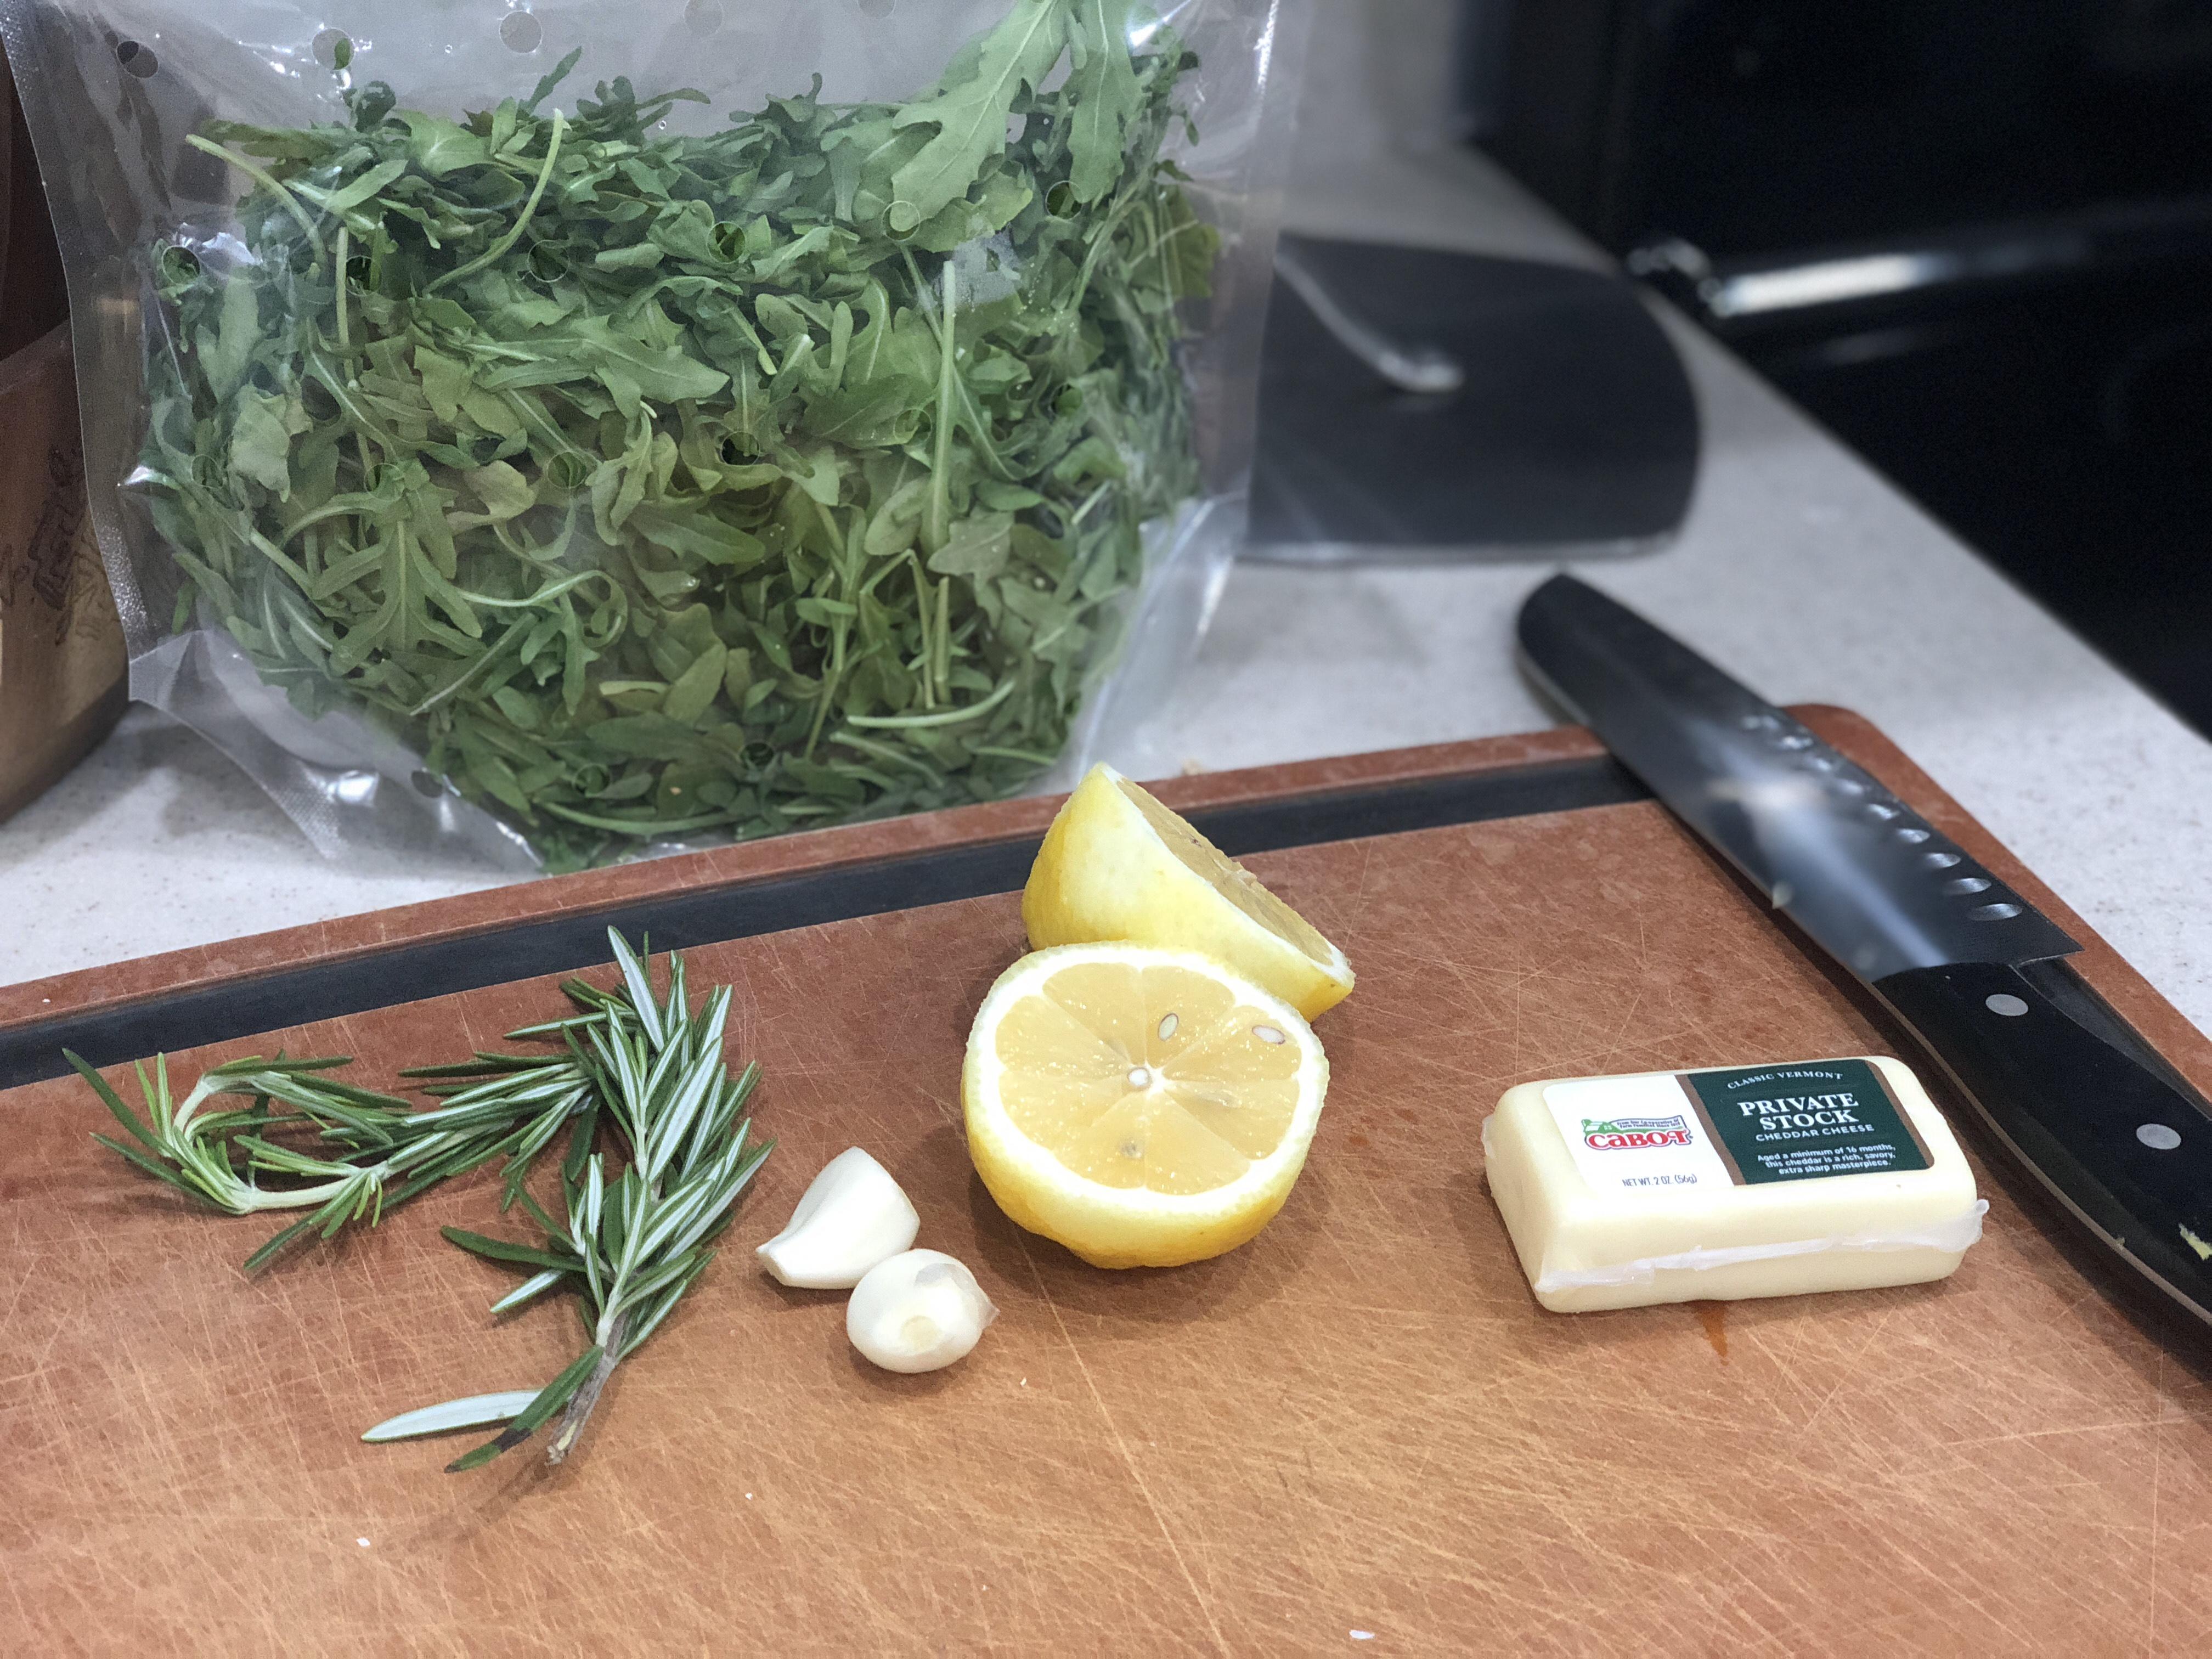 get a deal on your first box martha & marley spoon – fresh herbs, lemon, and garlic